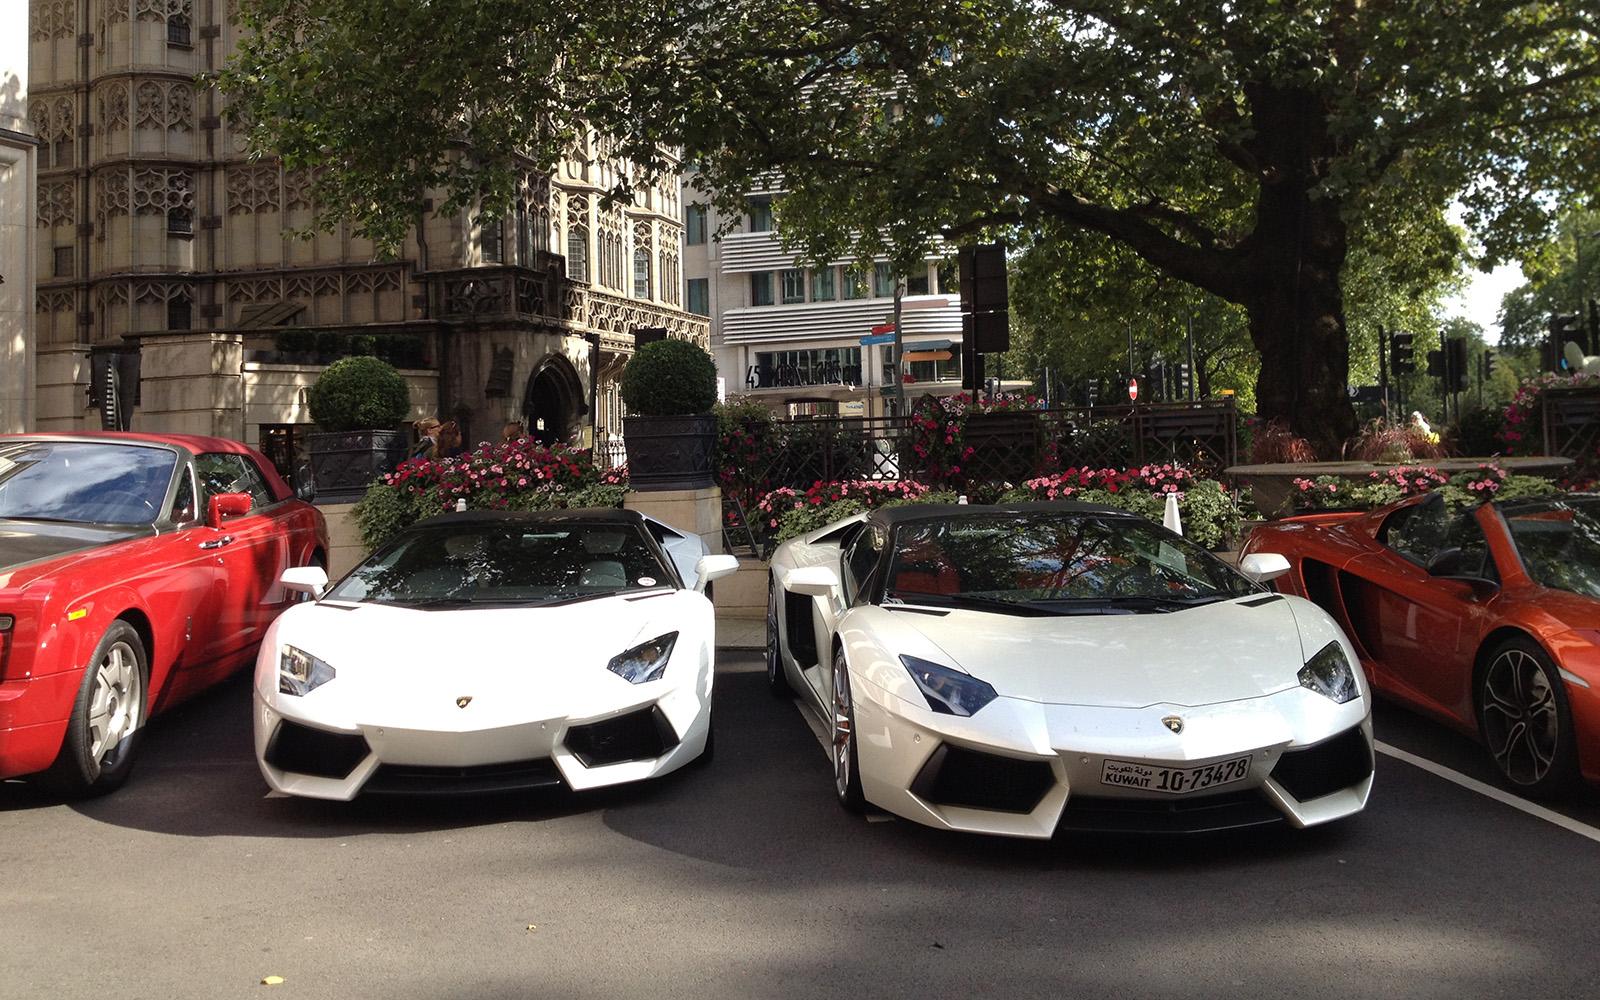 Hotels near Buckingham Palace, London - DoubleTree Hotel